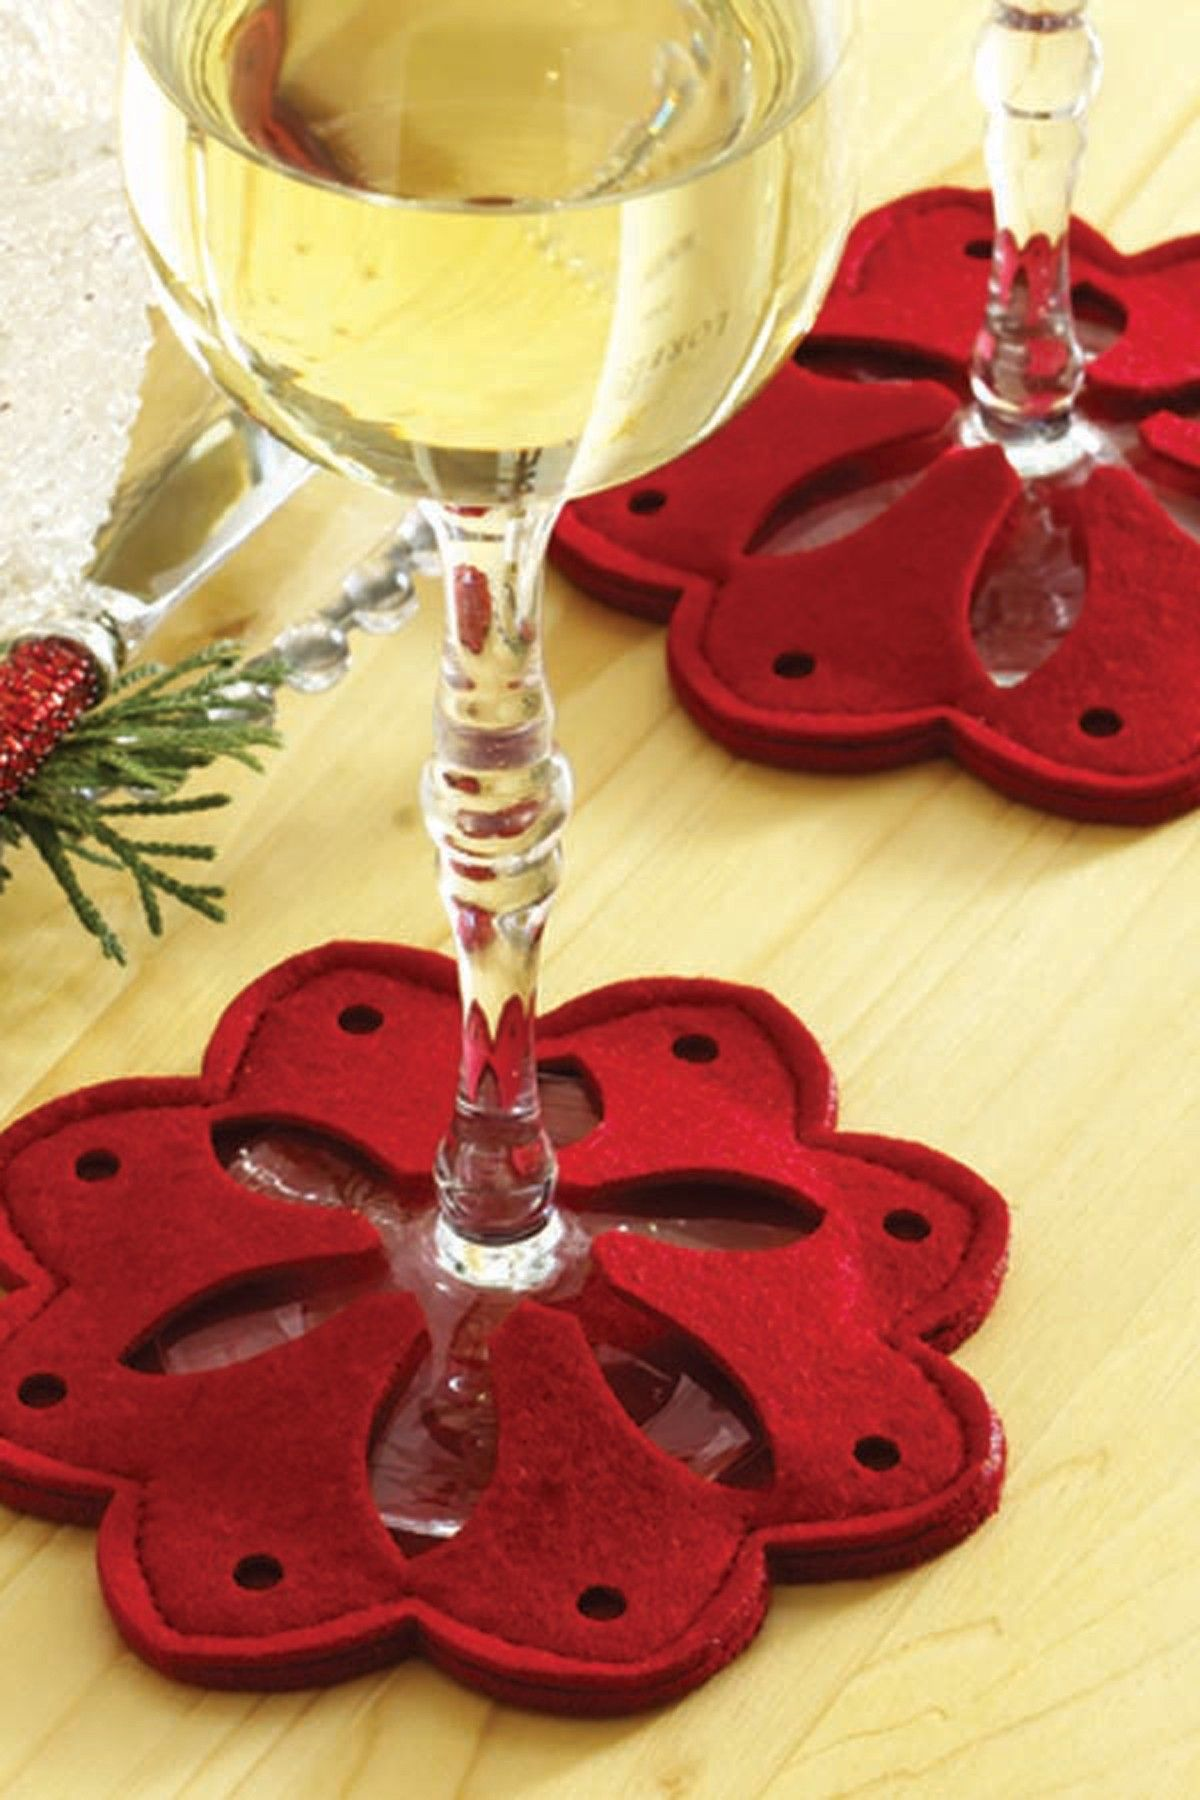 Summer Fun Decor By Tag Snowflake Wine Glass Coasters Red Set Of 4 Enfeites Natalinos Em Feltro Feltro Natal Porta Copos